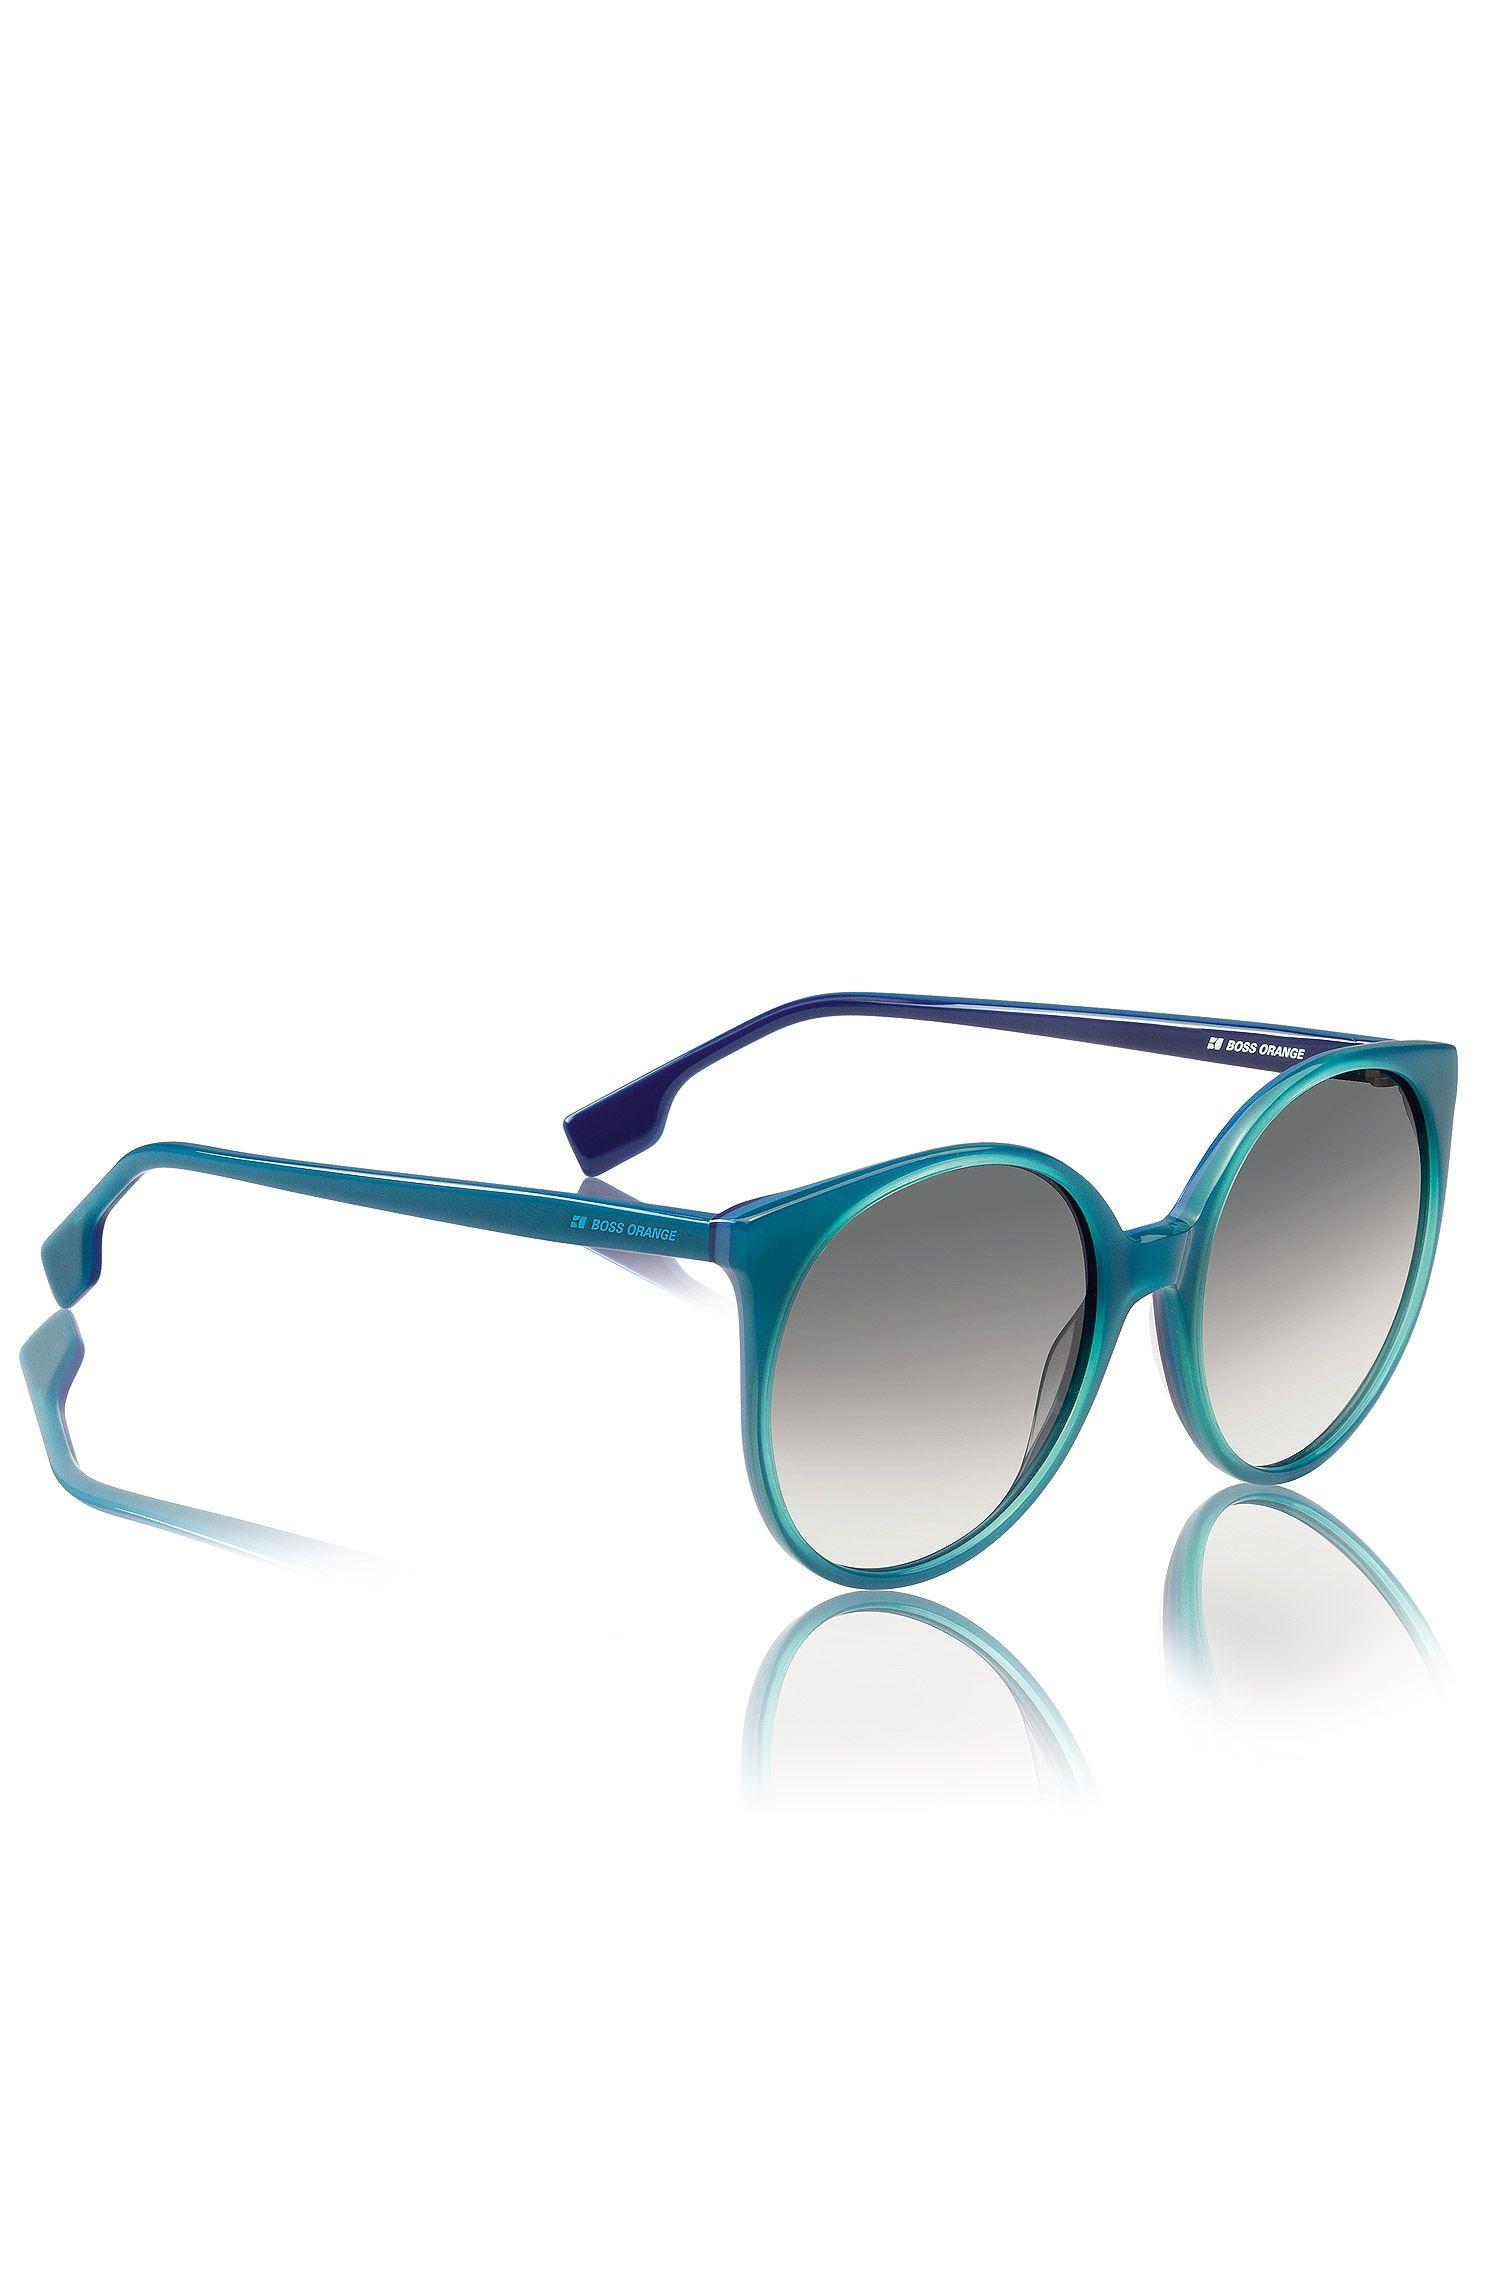 Damensonnenbrille ´BO 034/S` im Wayfarer-Look